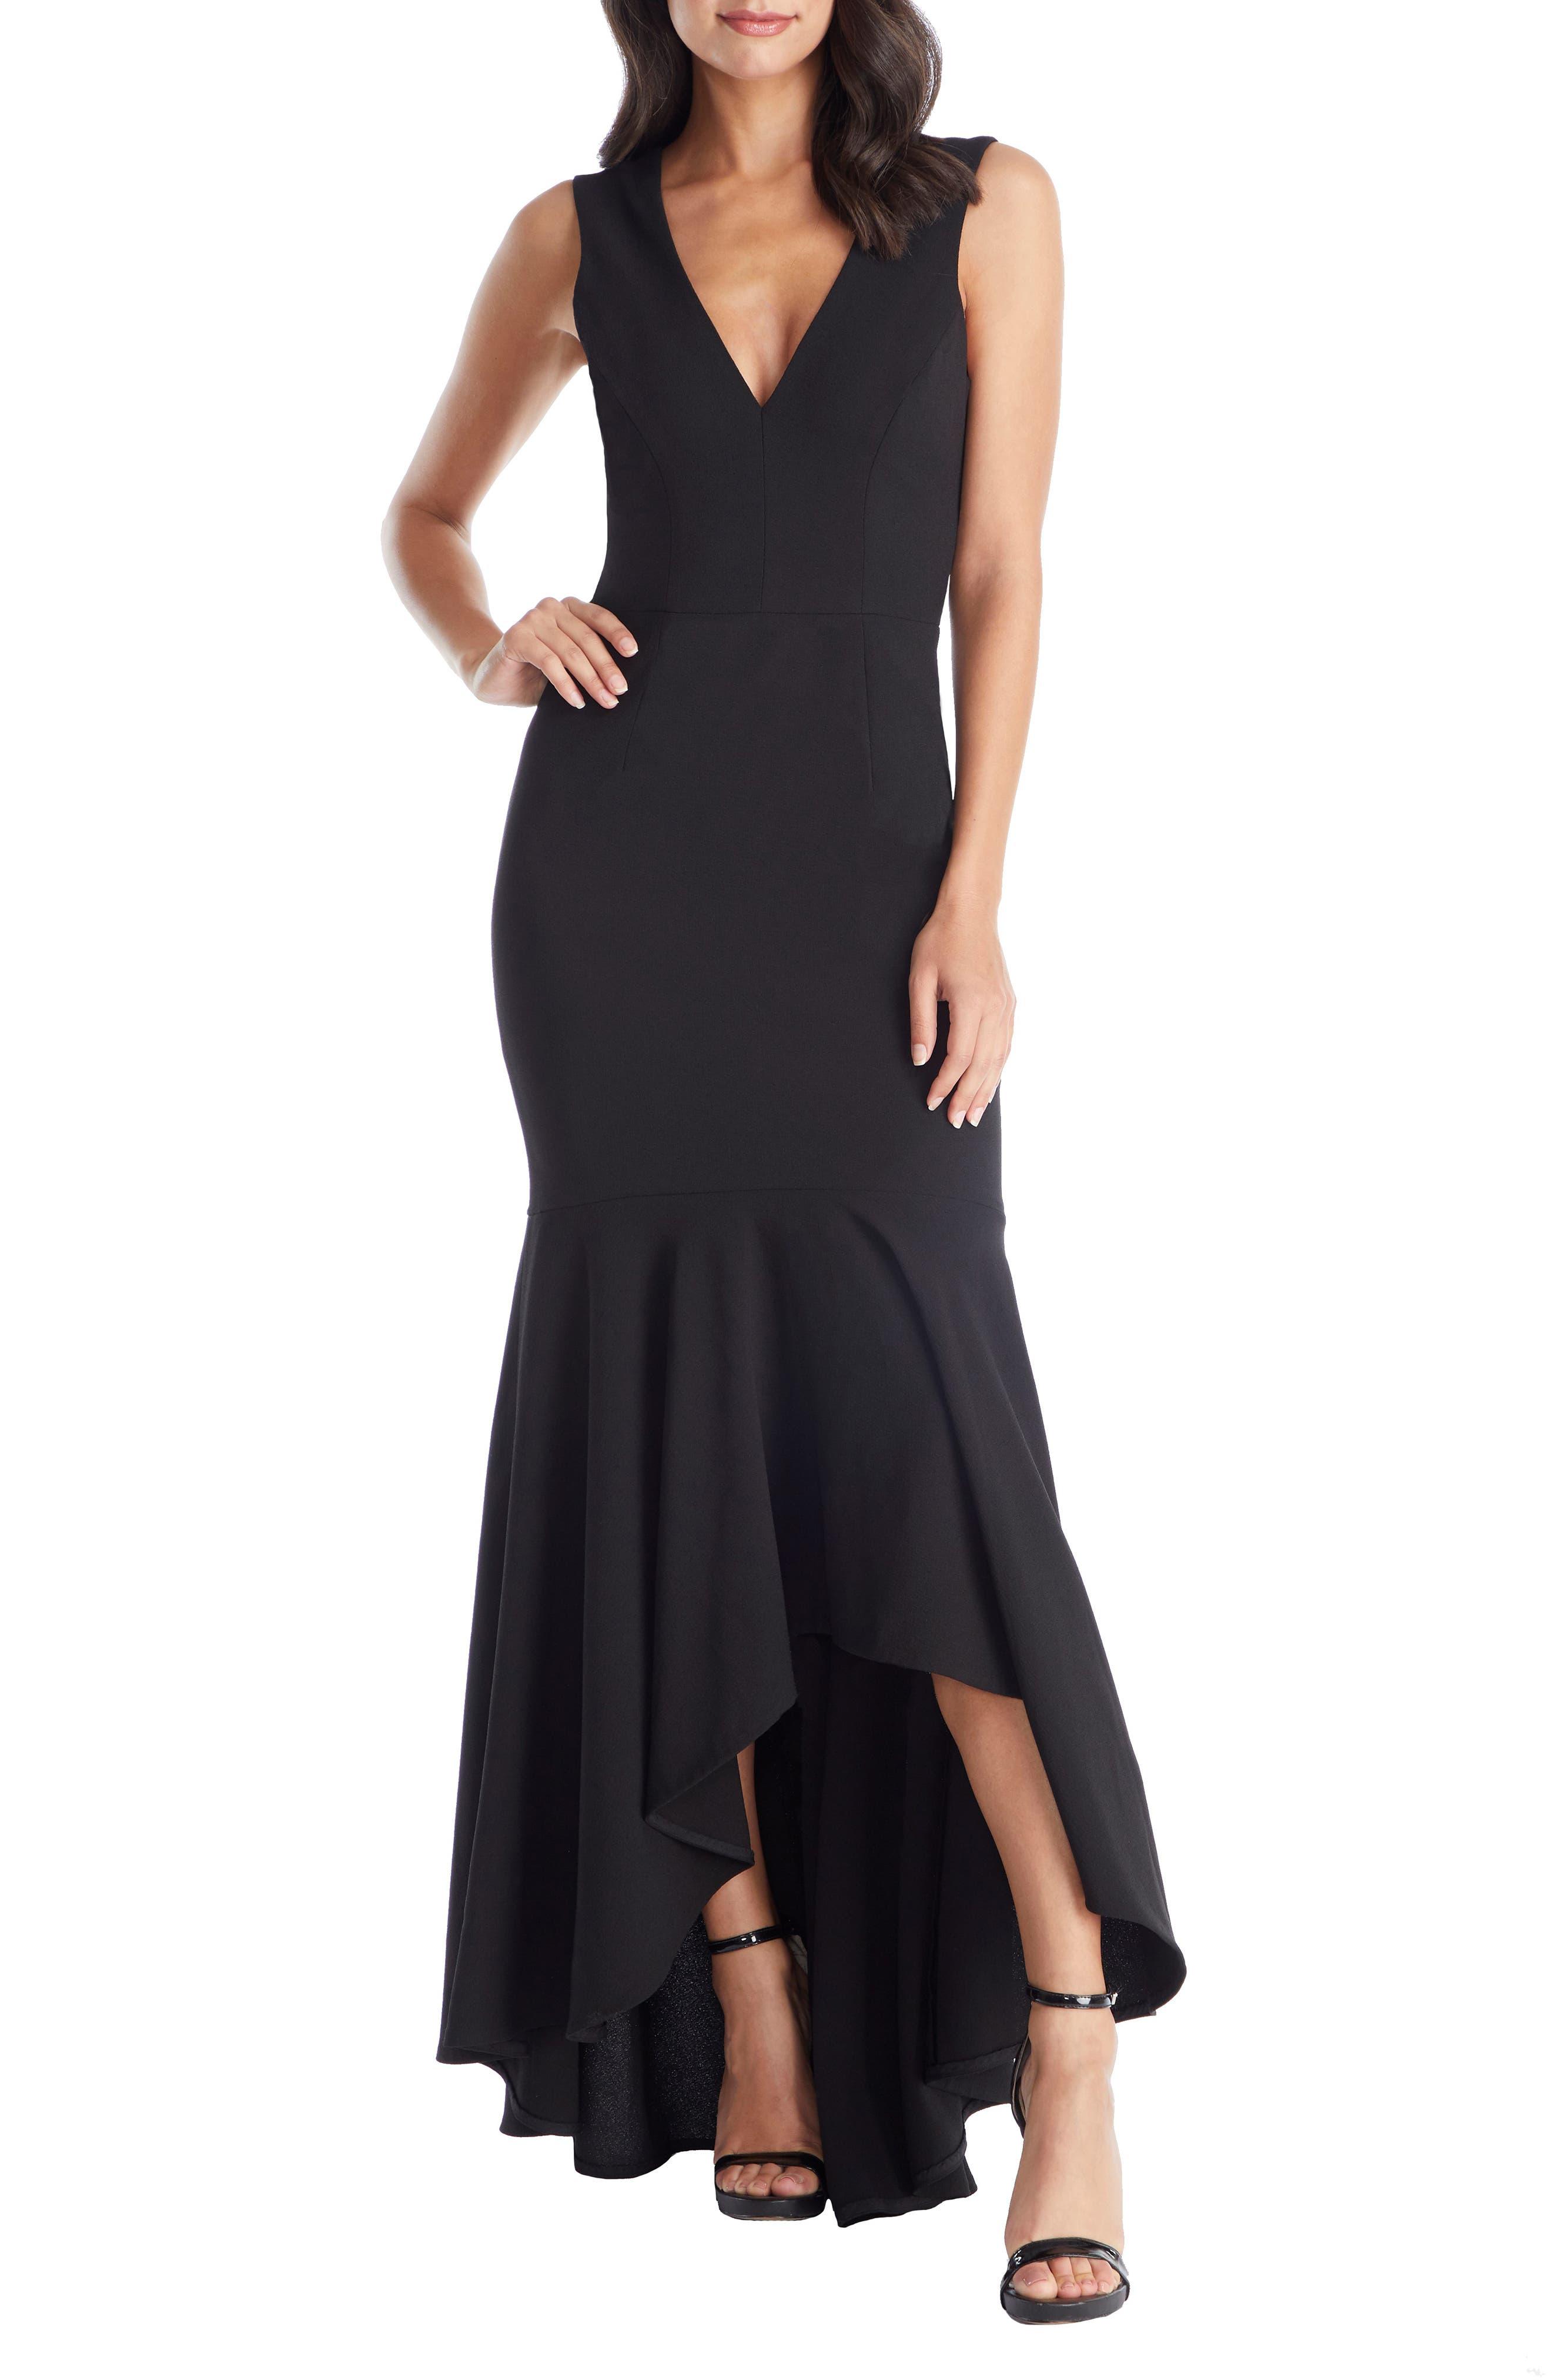 DRESS THE POPULATION Demi High/Low Mermaid Hem Evening Dress, Main, color, BLACK